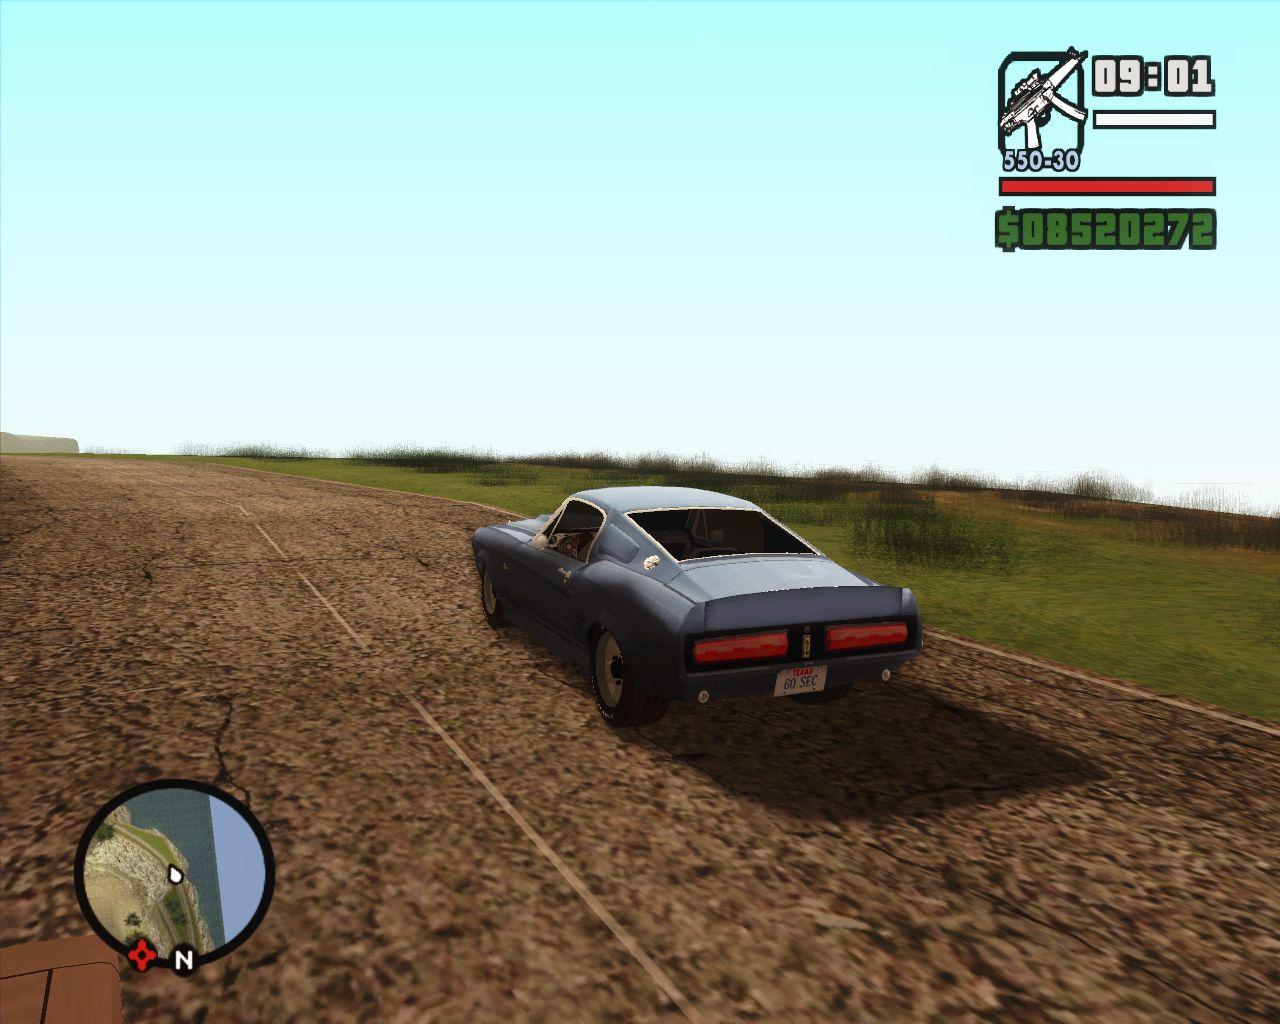 gta_sa 2008-04-11 20-46-34-62.jpg - Grand Theft Auto: San Andreas